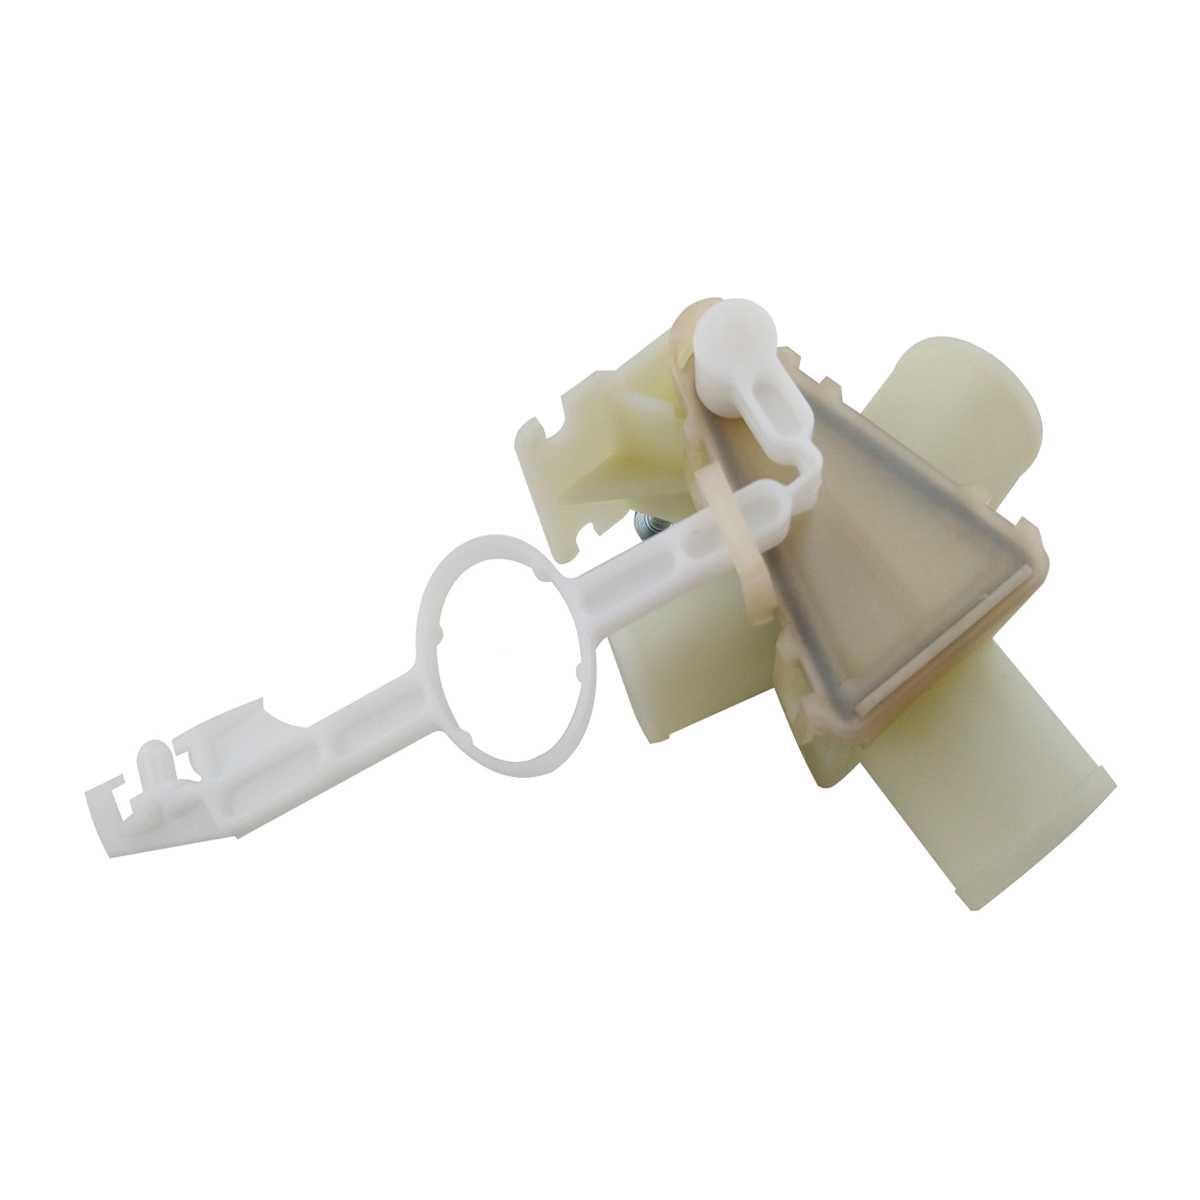 Válvula direcionadora de fluxo para lavadora Electrolux